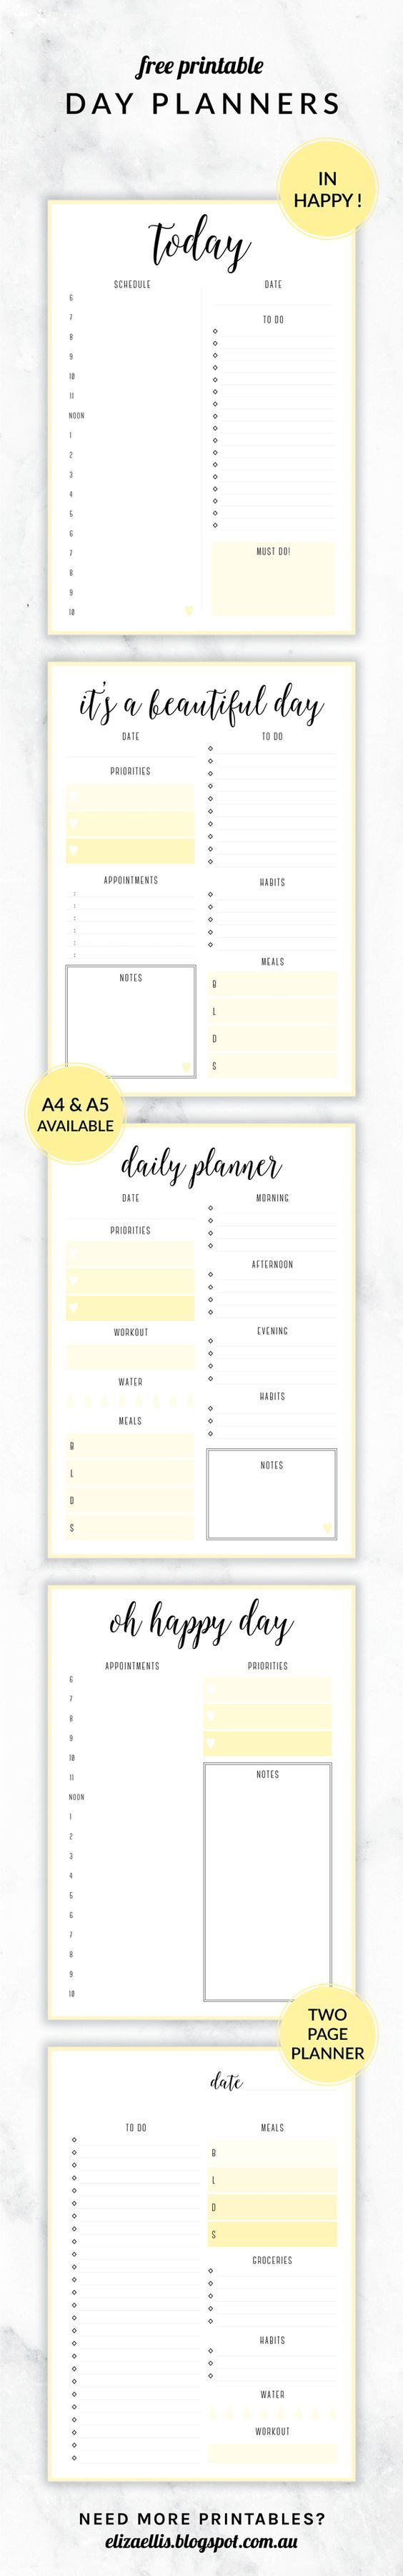 Microsoft Daily Planner Awesome Free Printables In Happyelizaellis #freeprintables  Free .